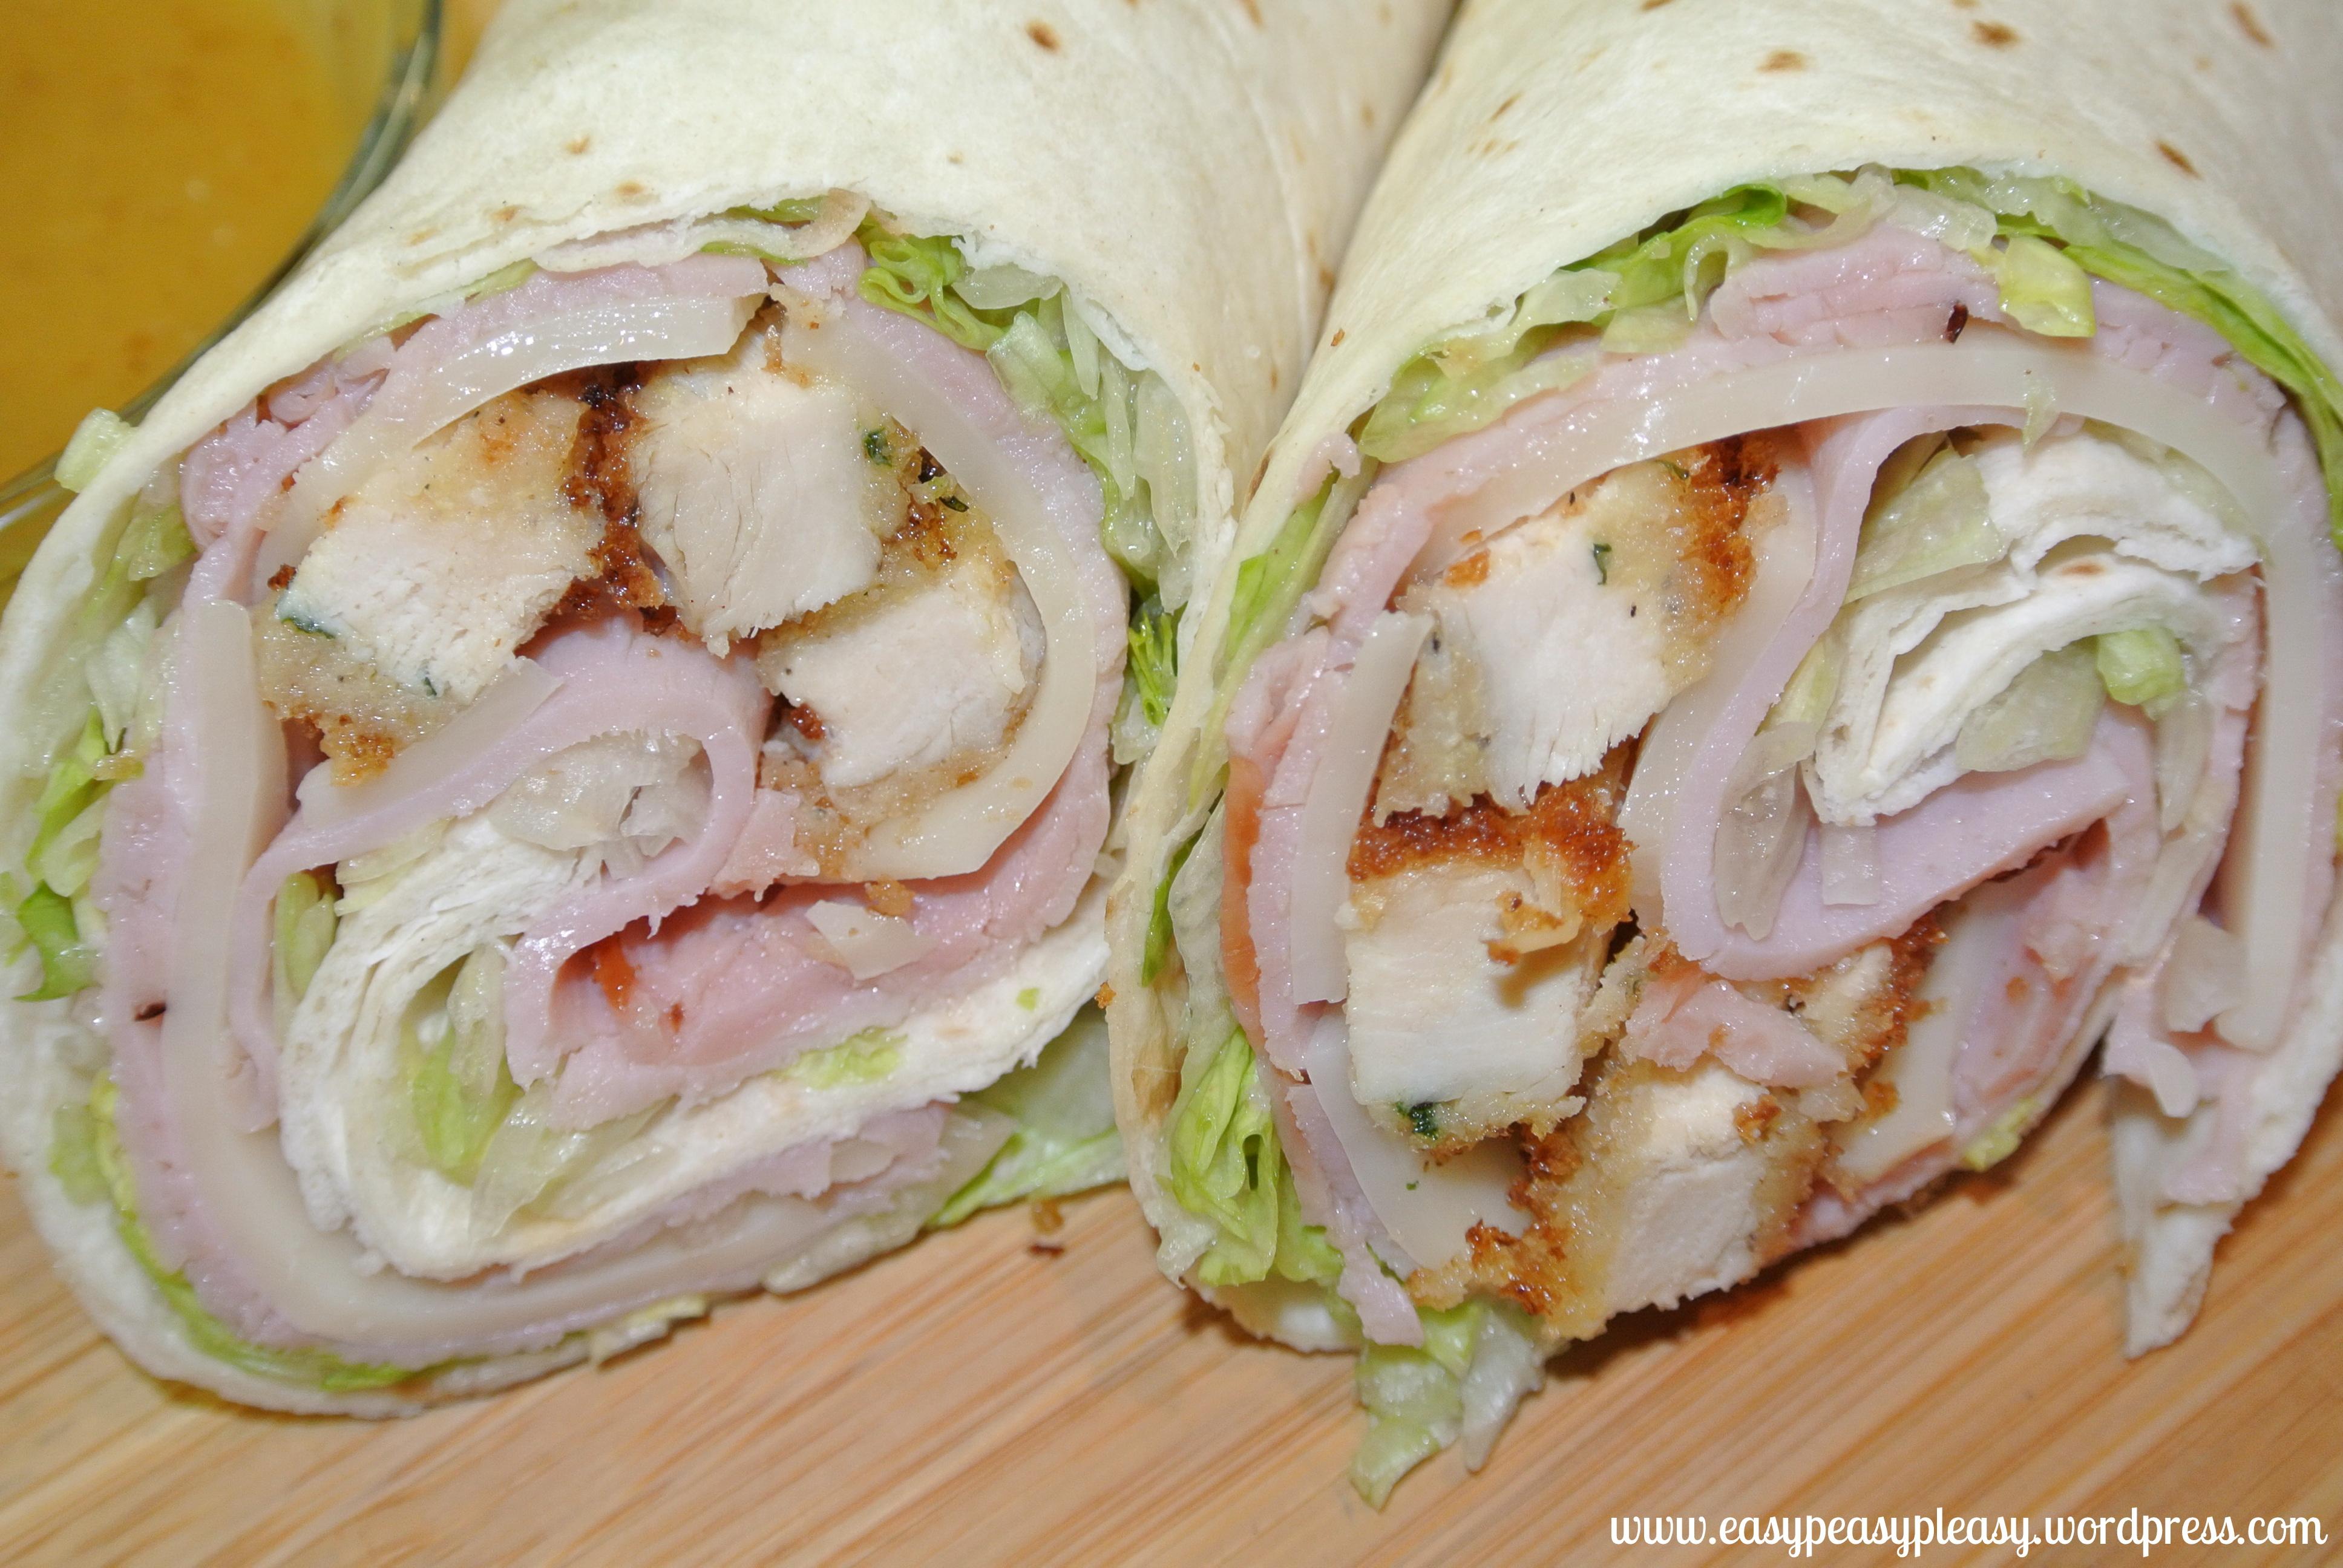 Chicken cordon bleu wraps and a double duty meal idea easy peasy chicken cordon bleu wraps and recipes at httpseasypeasypleasy forumfinder Gallery